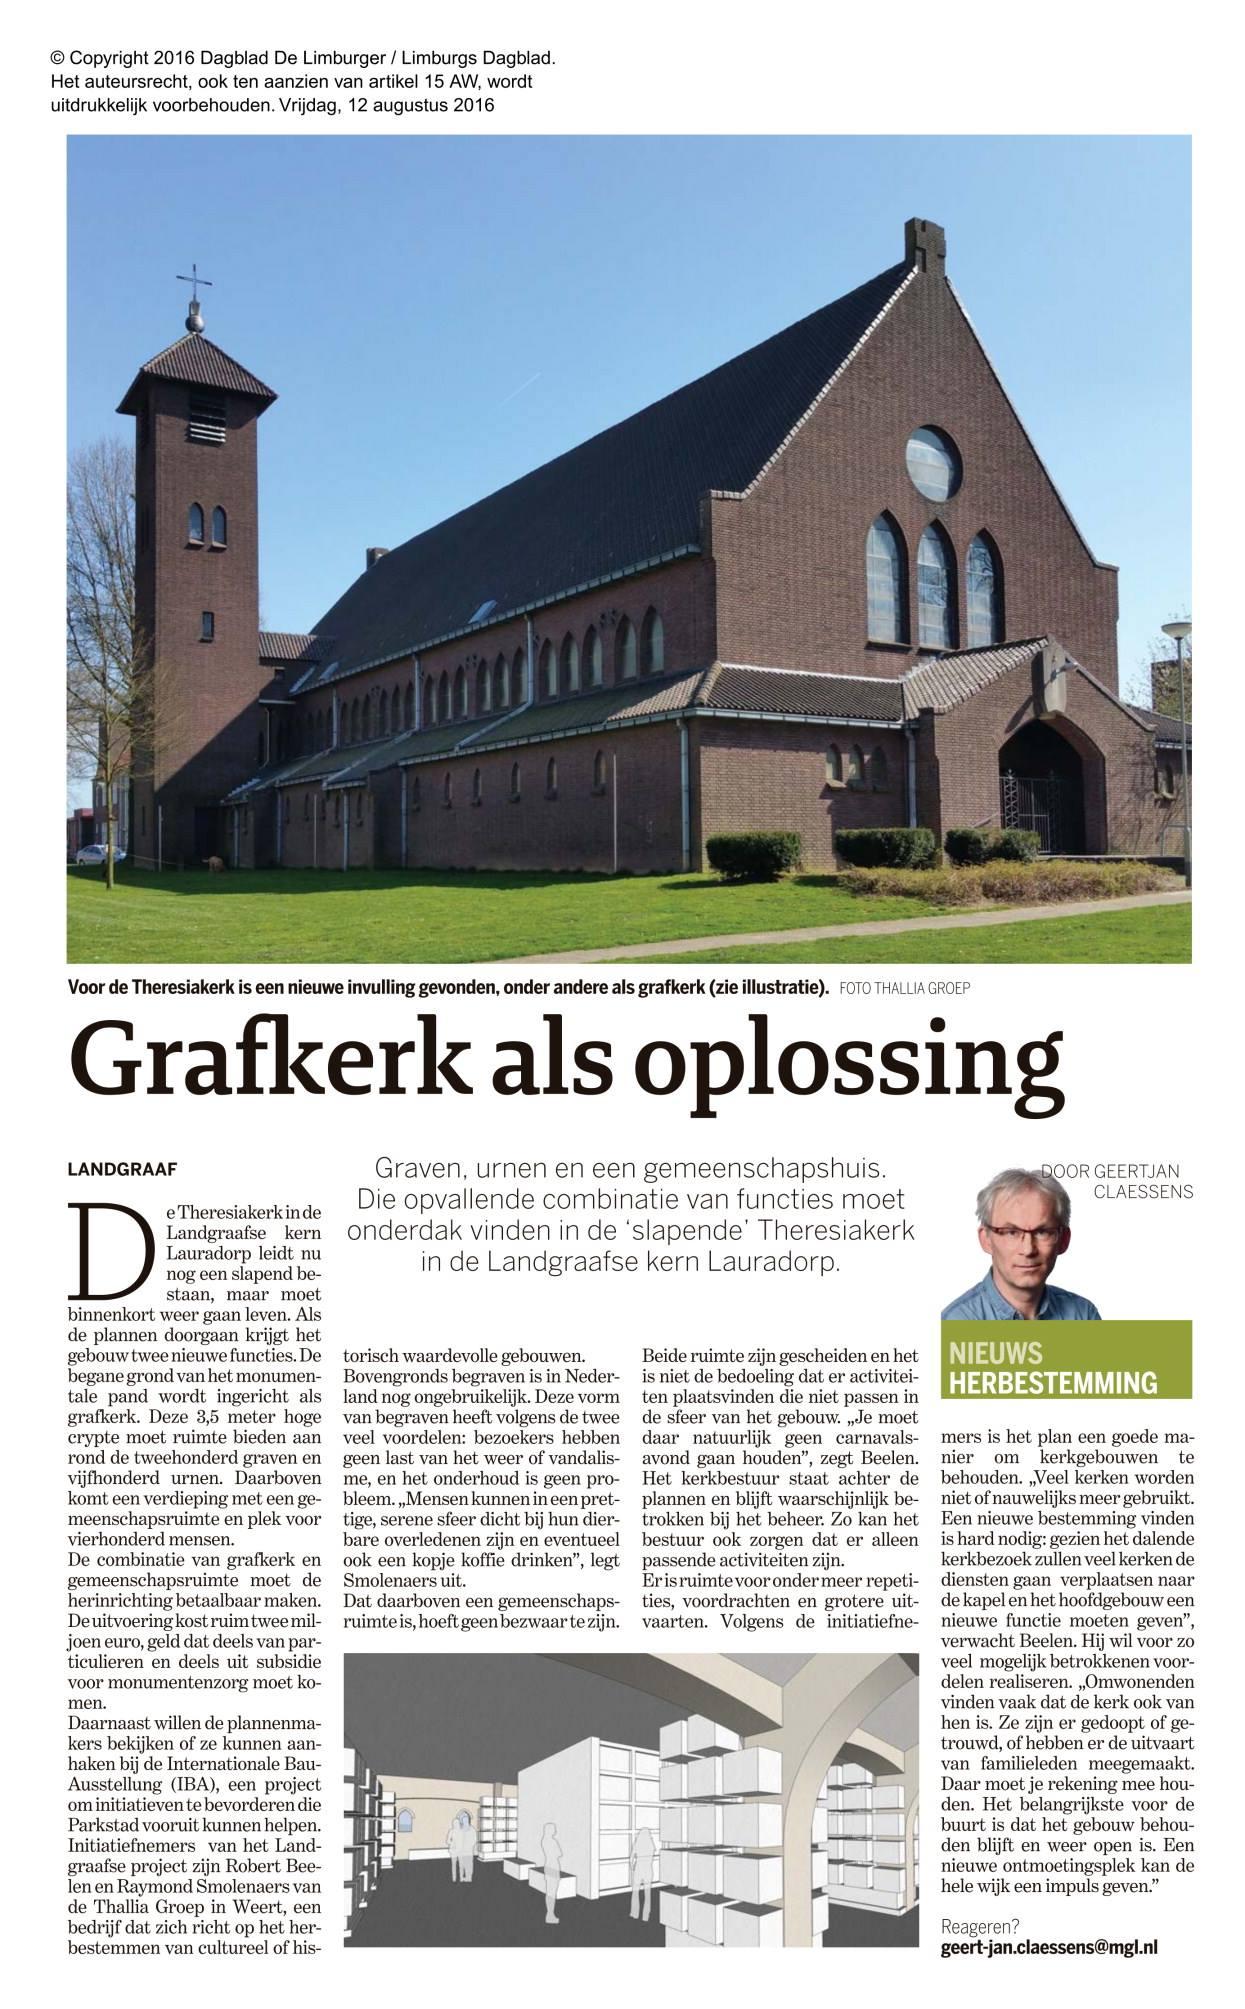 Krantartikel grafkerk als oplossing - Herbestemming Theresiakerk, Landgraaf - BEELEN CS architecten Eindhoven / Thalliagroep Weert